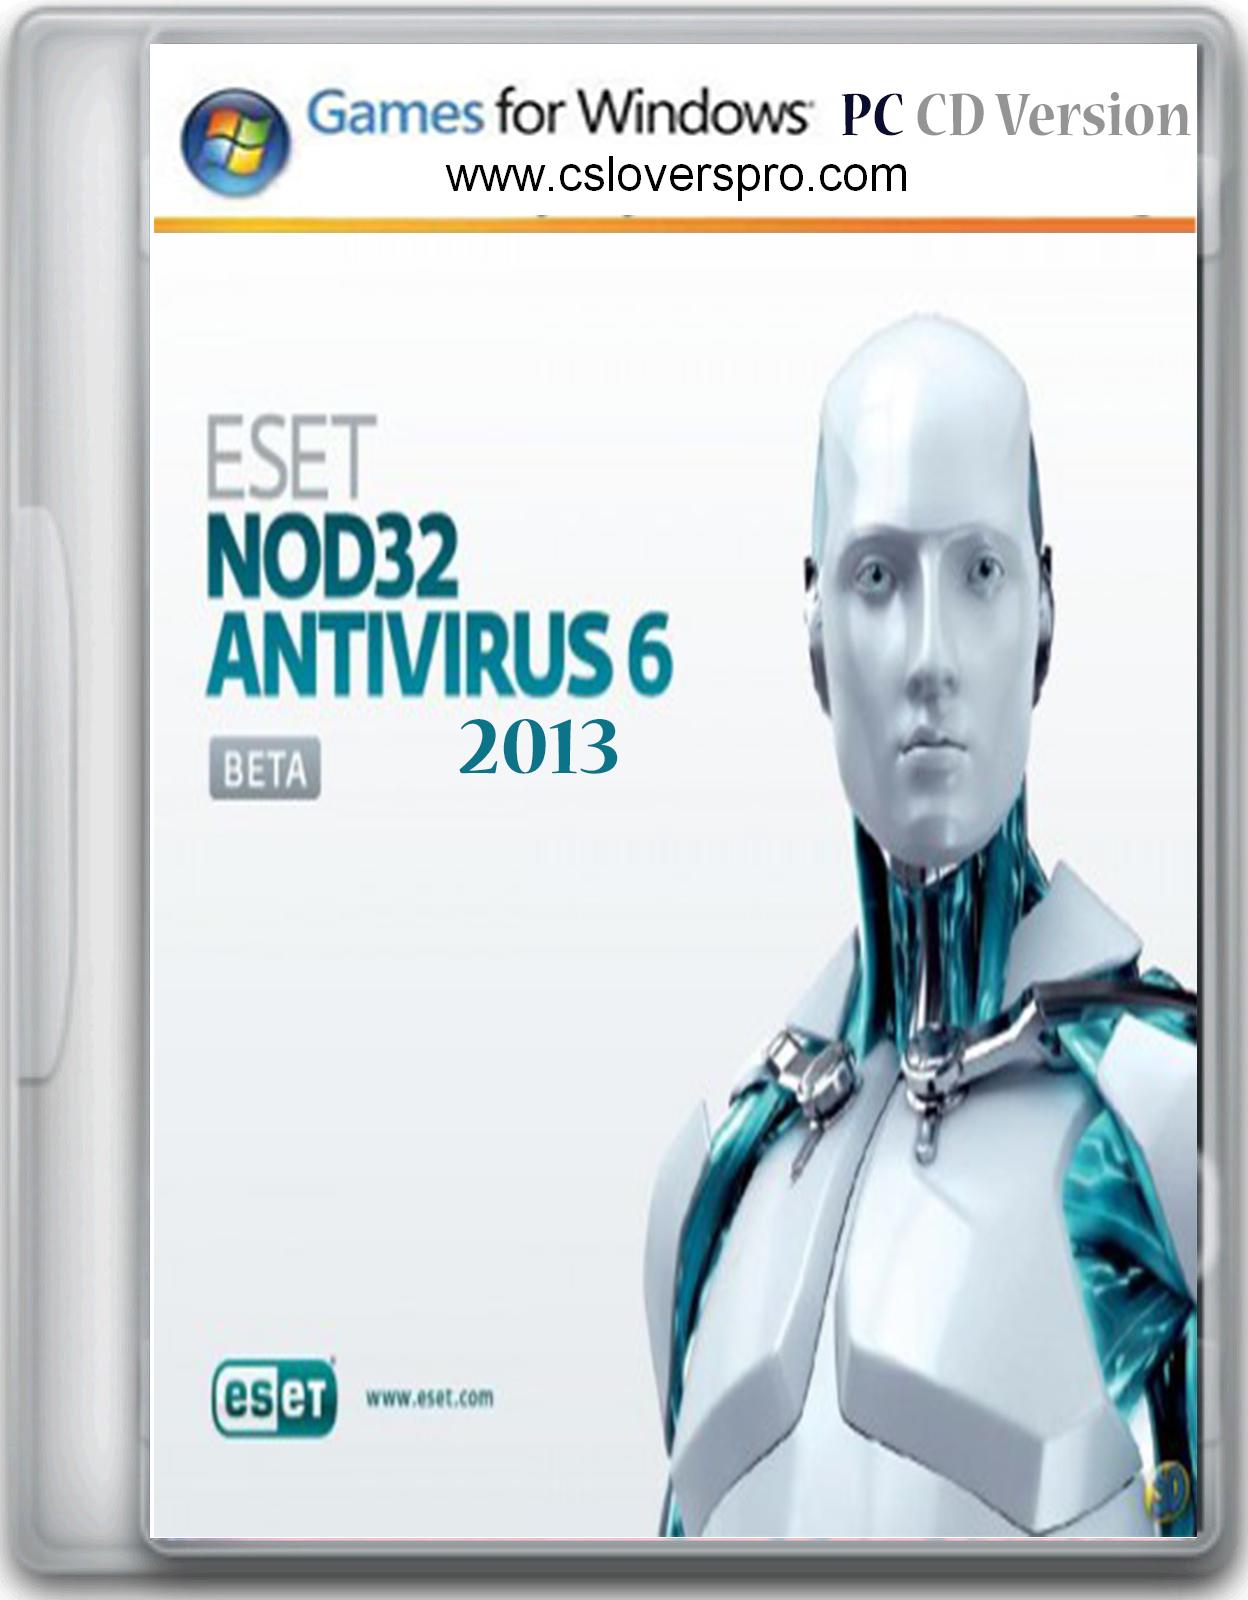 Eset nod32 antivirus 6 free download latest 2017 ...